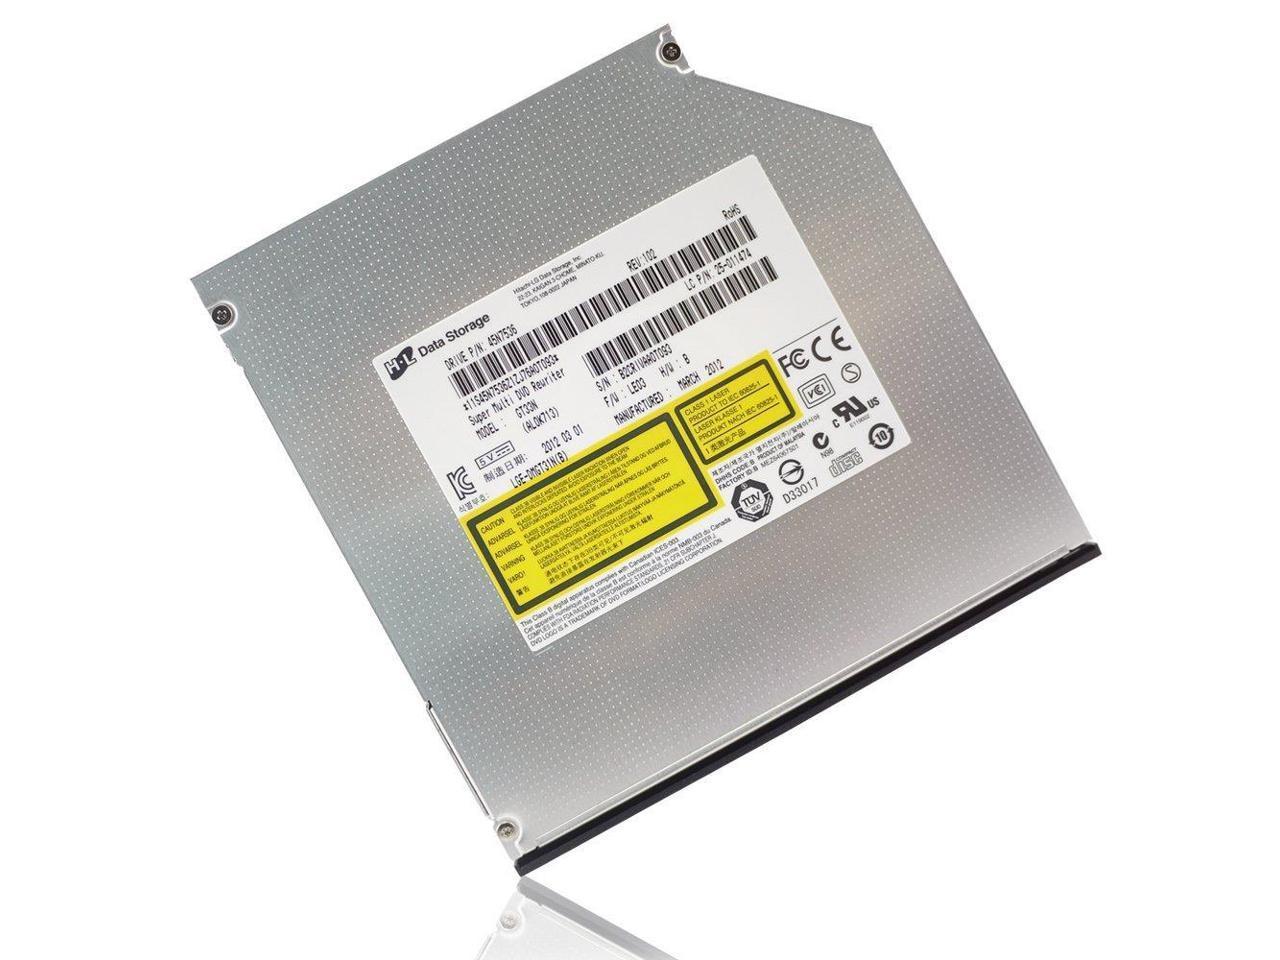 USB 2.0 External CD//DVD Drive for Acer Aspire 5820G